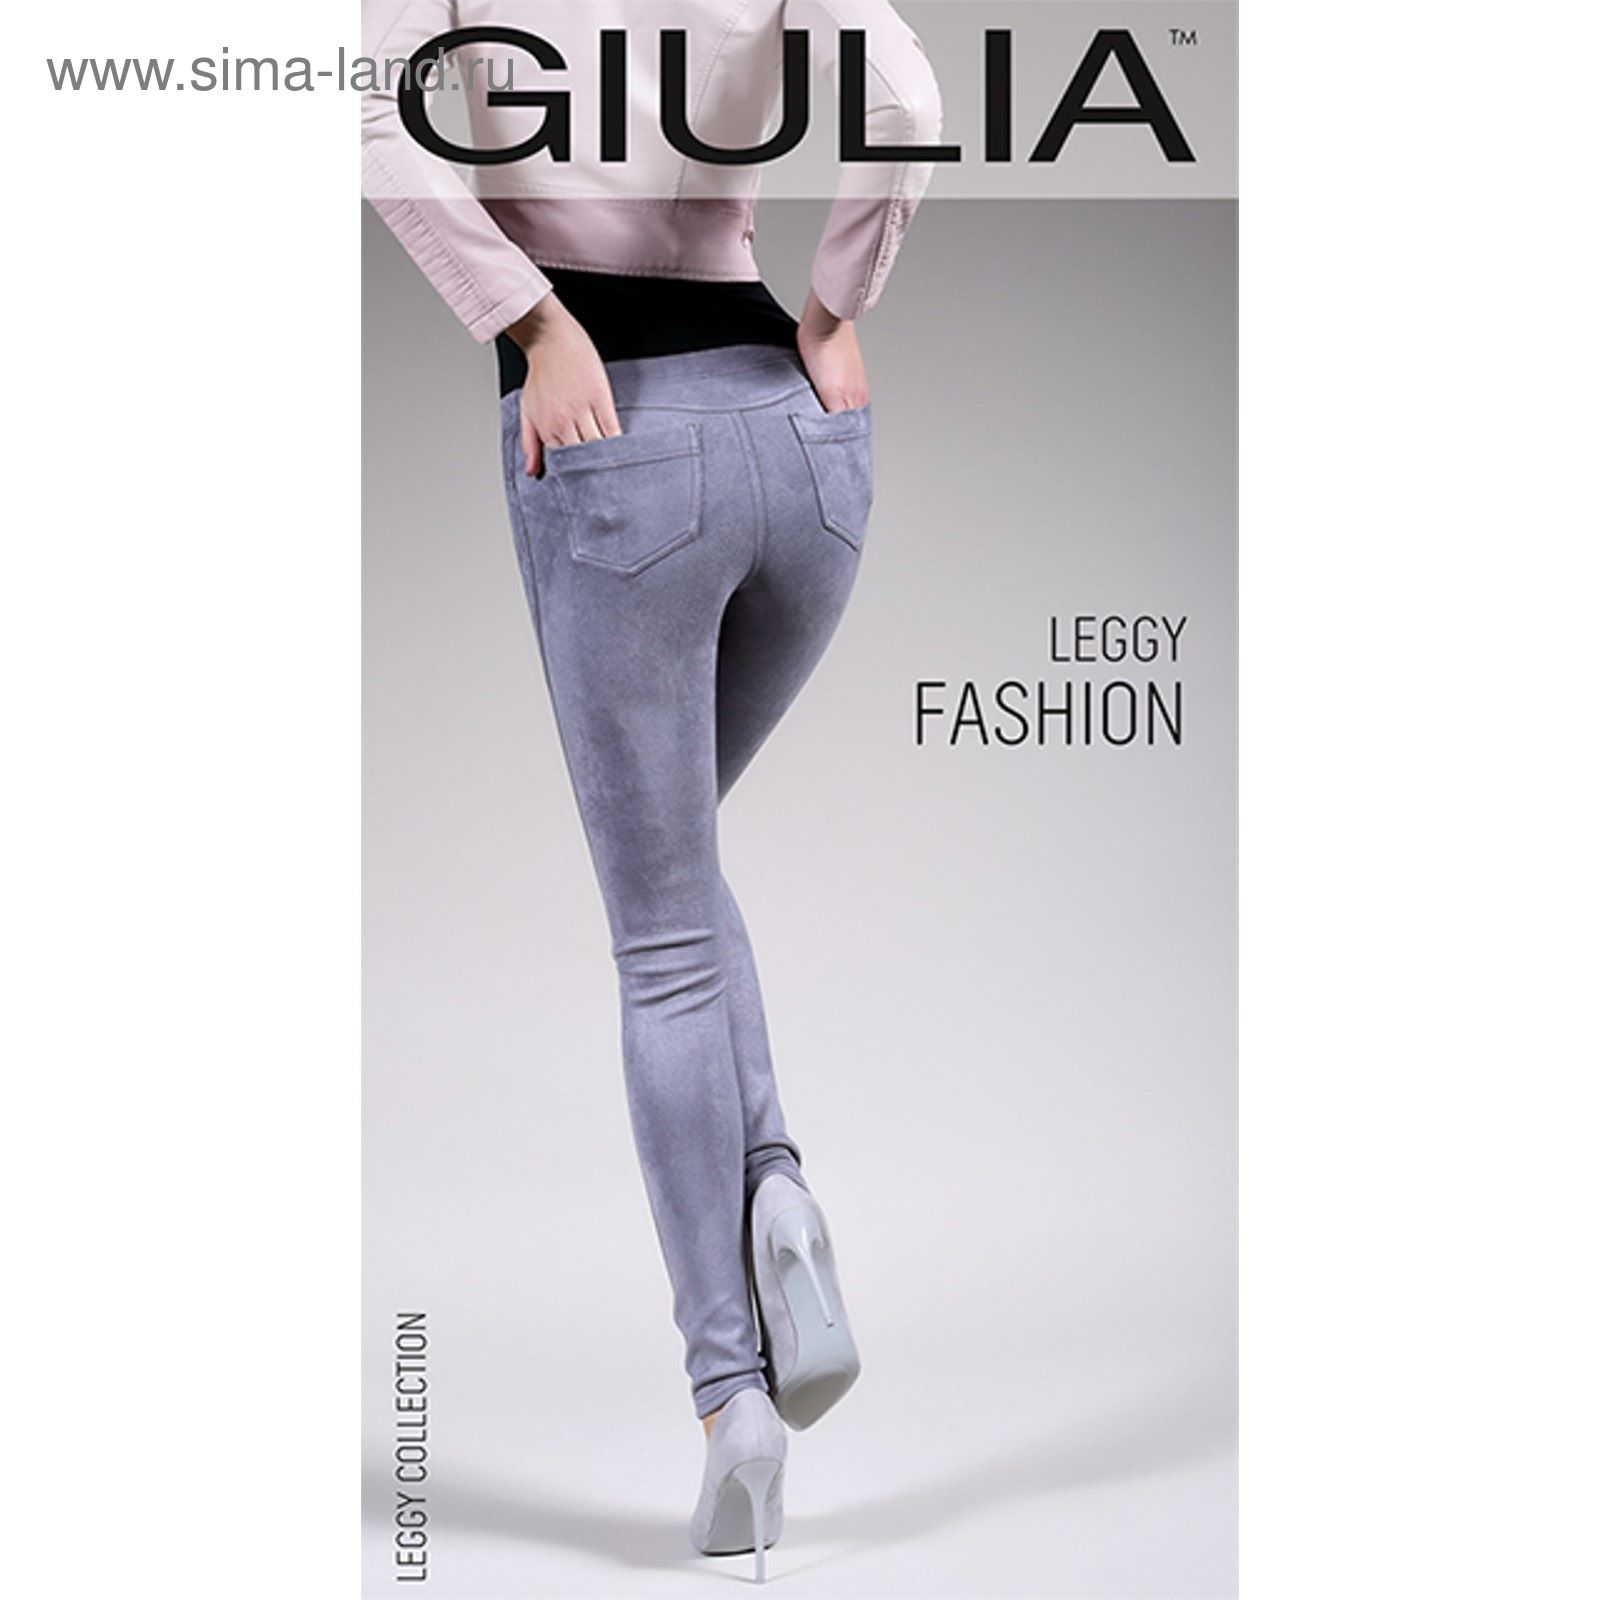 Леггинсы женские LEGGY FASHION 01, цвет foxy gul, размер S (618694 ... 33360878fee